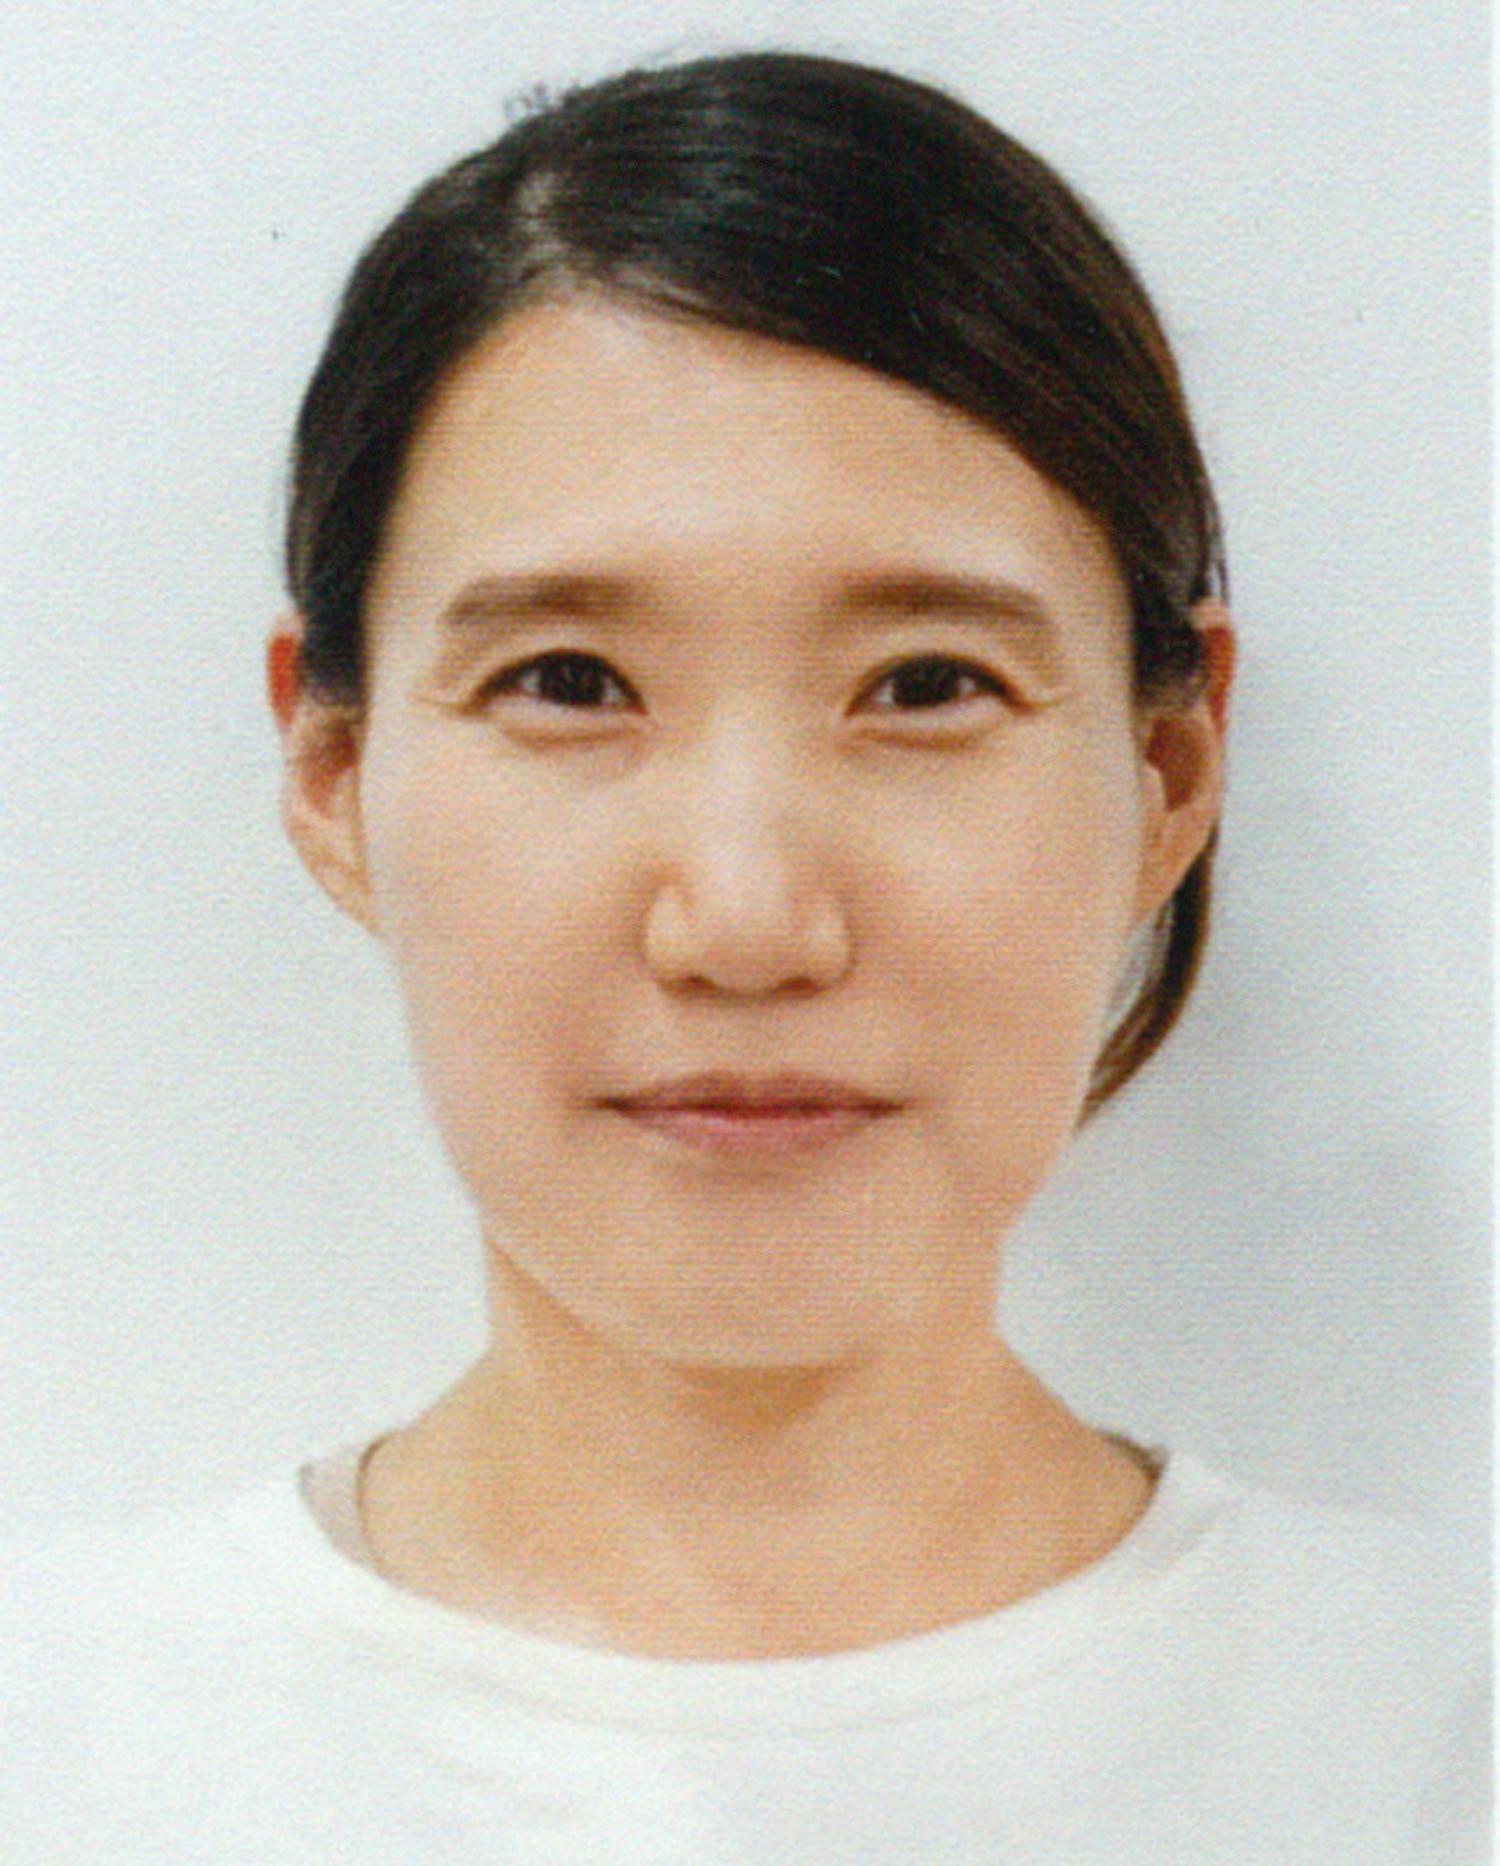 SunyoungKim.jpg